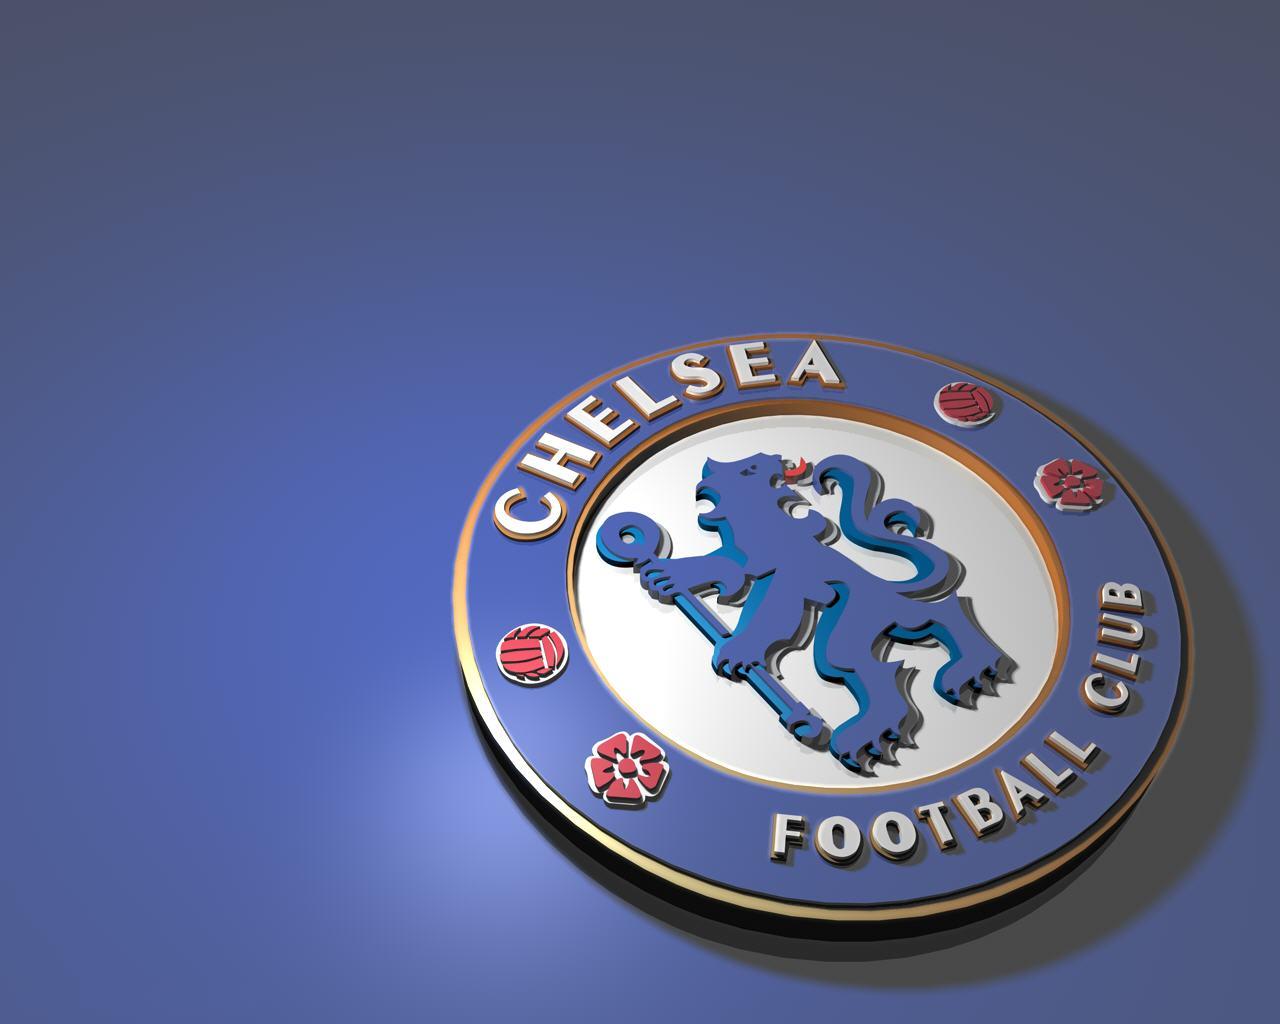 Chelsea FC And Sauber F1 Worldwide